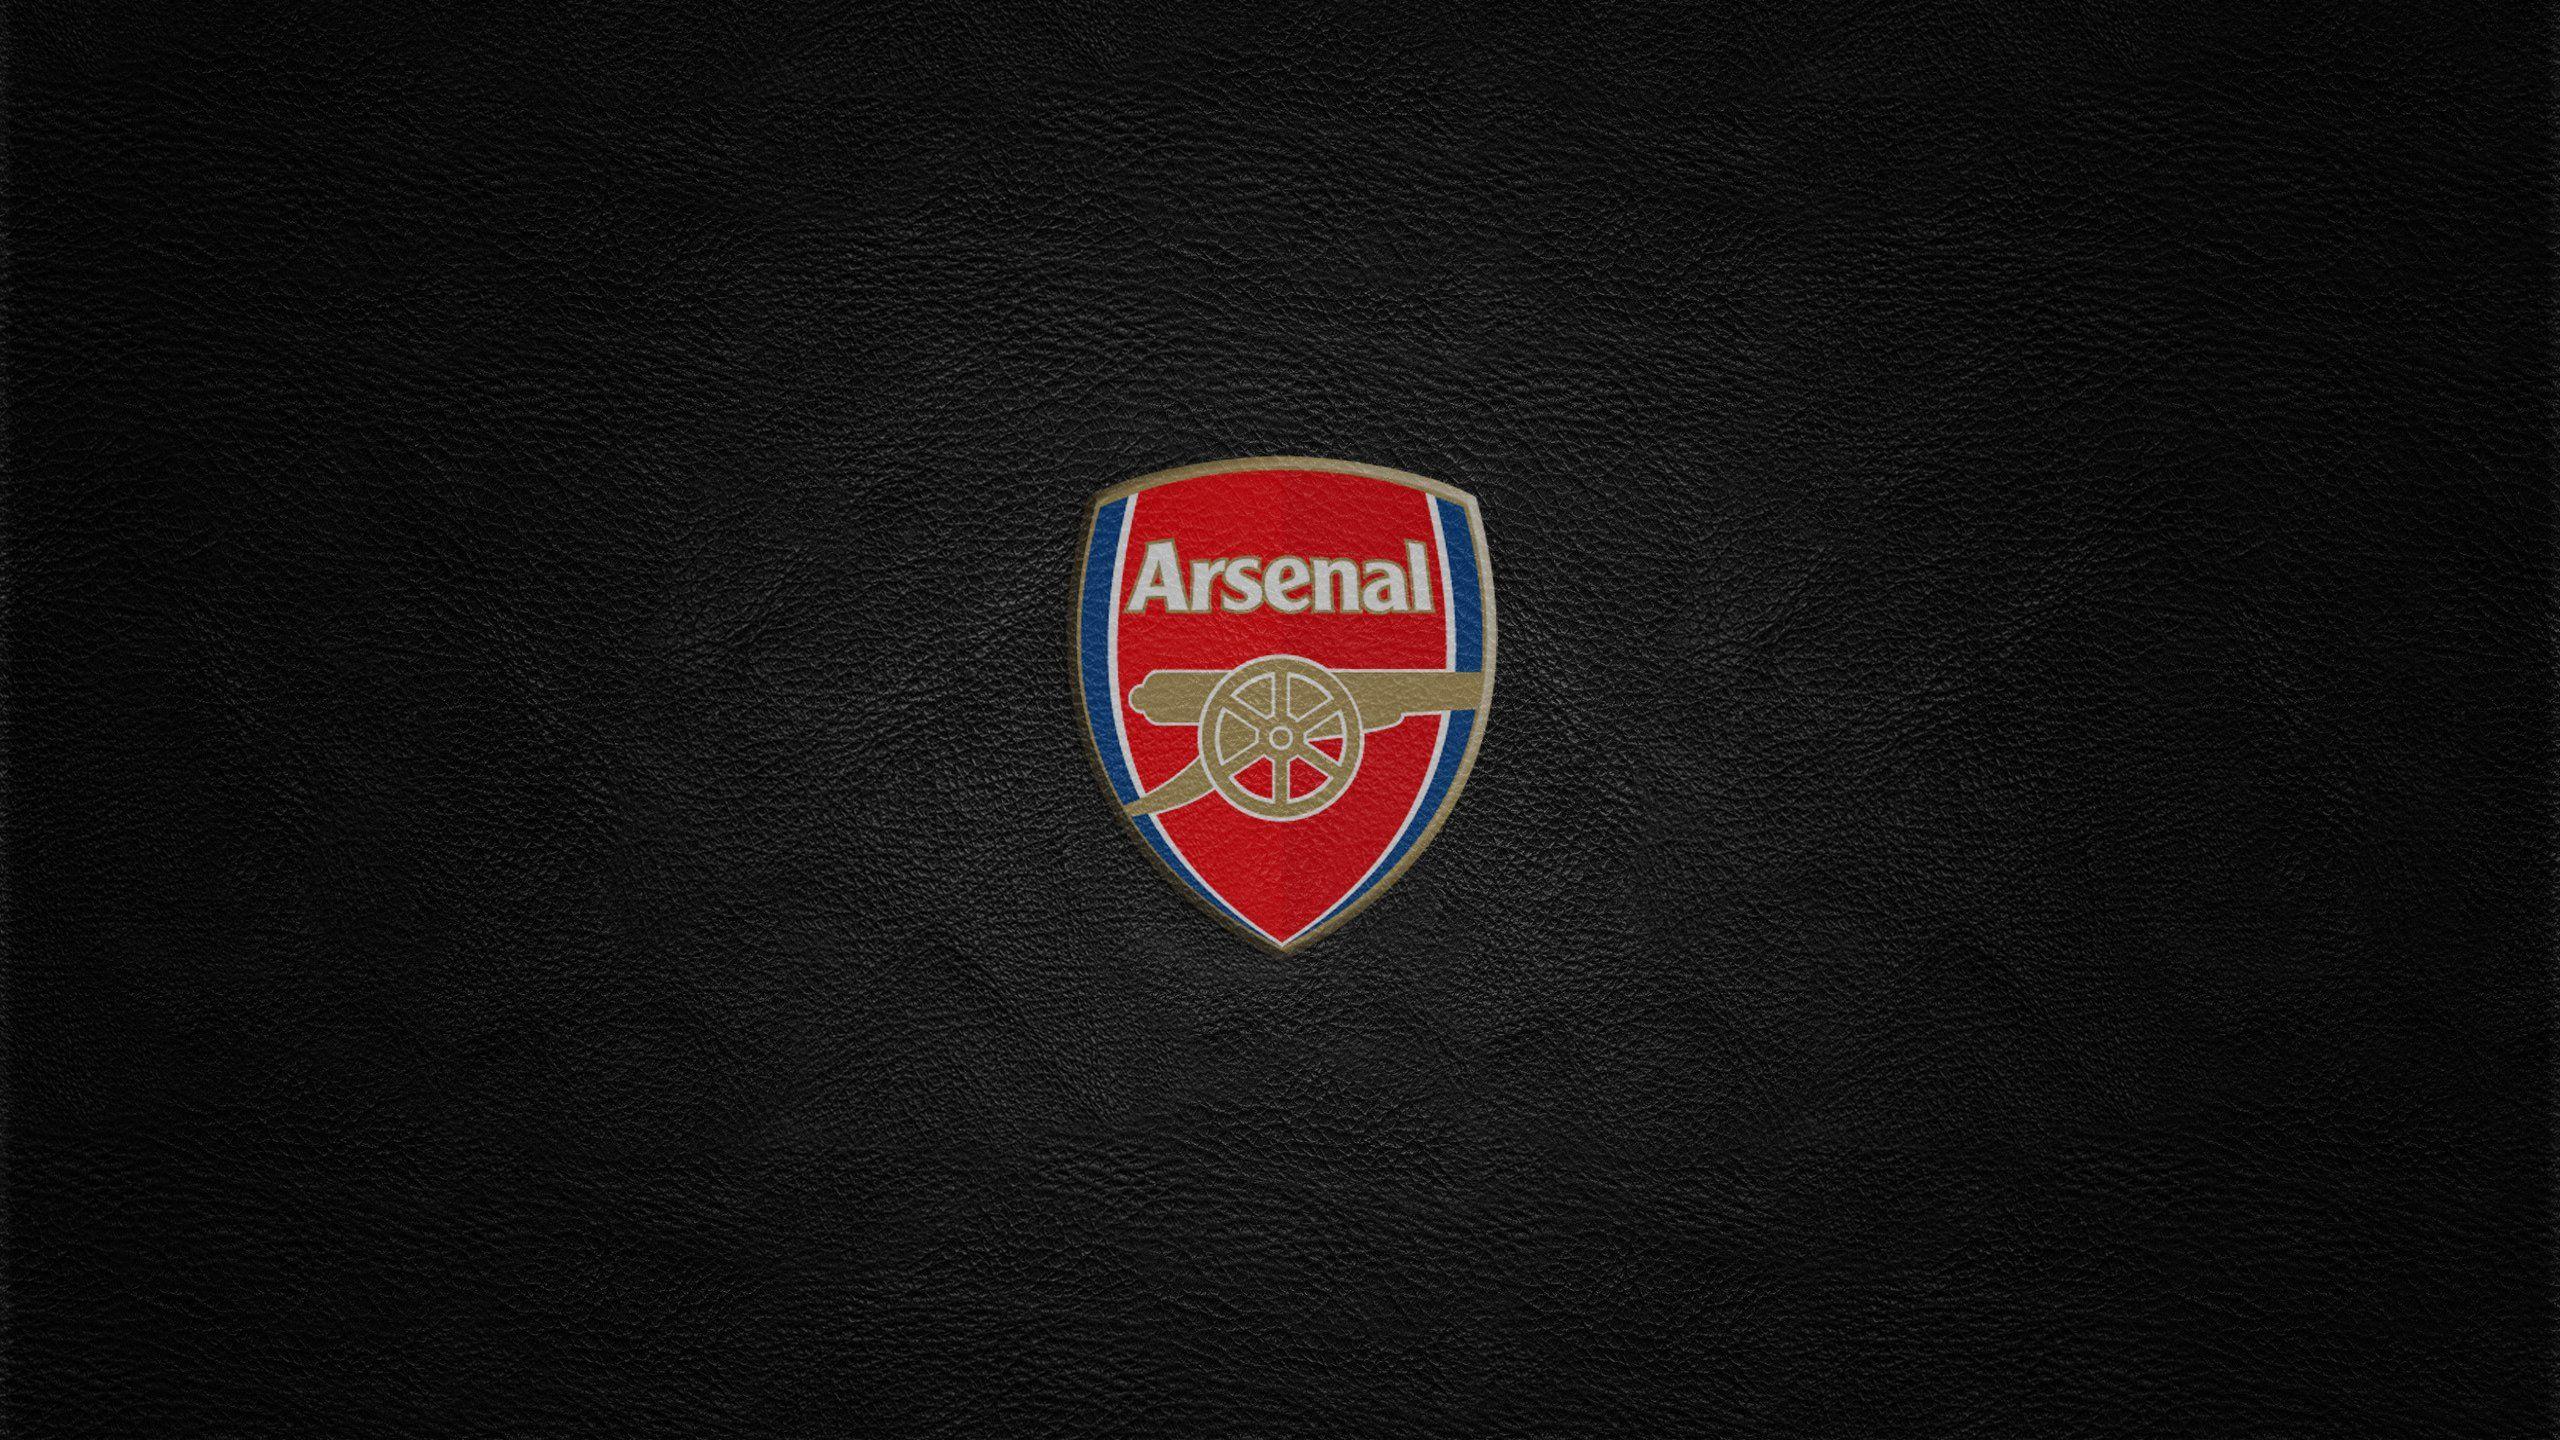 Arsenal Wallpaper Clubs Hd Backgrounds